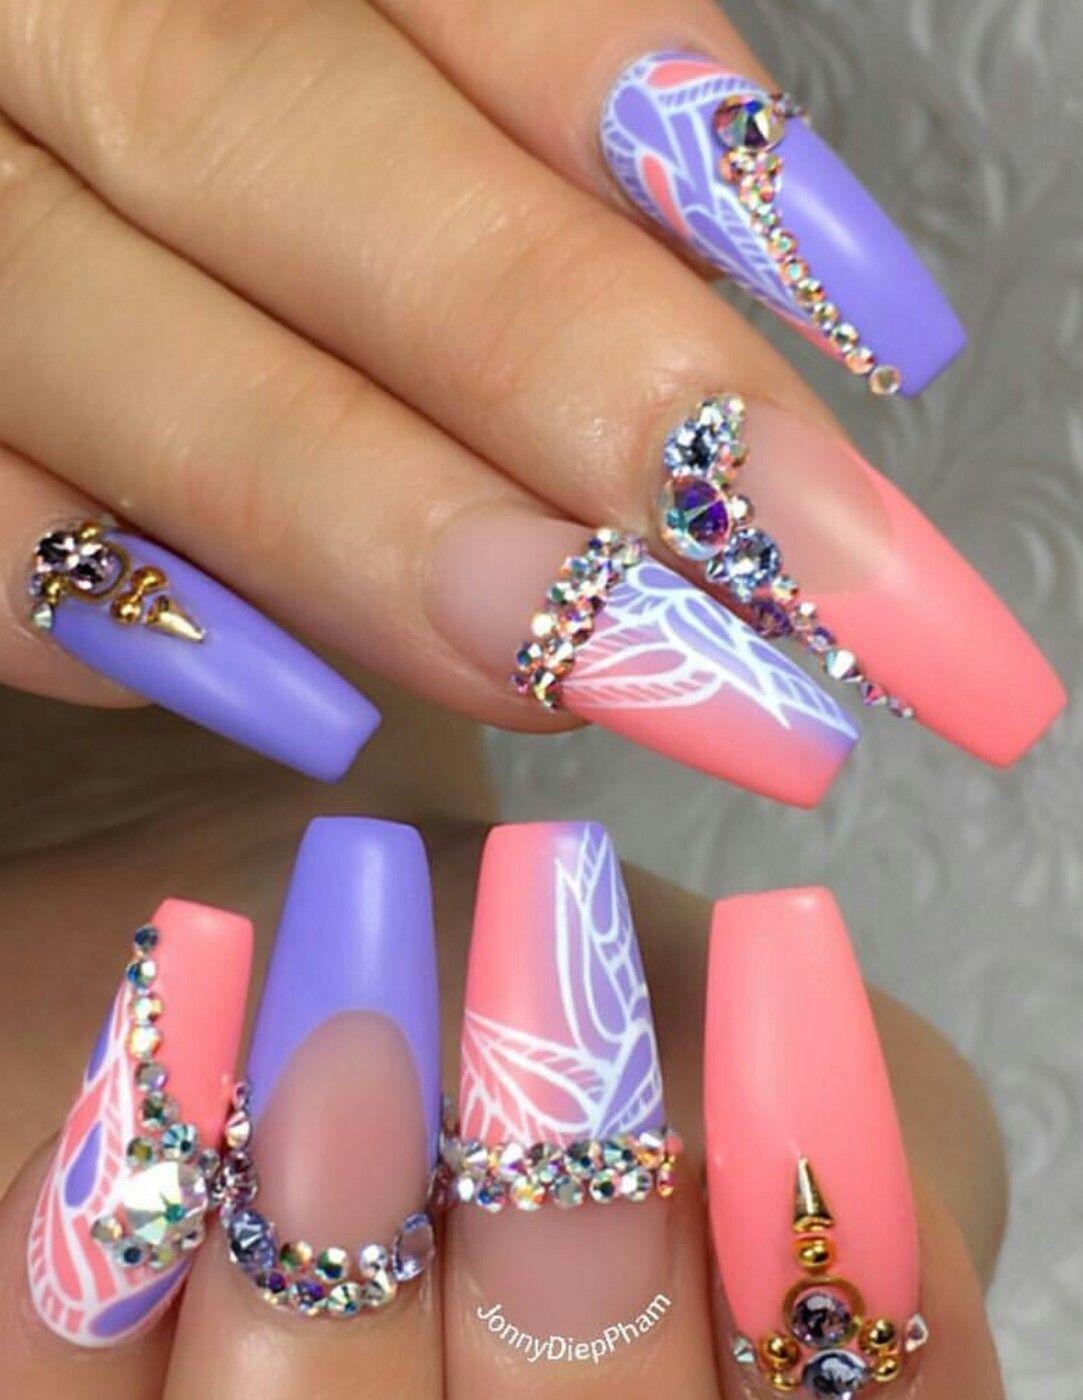 purple pink rhinestone nails design nailart jonnydieppham